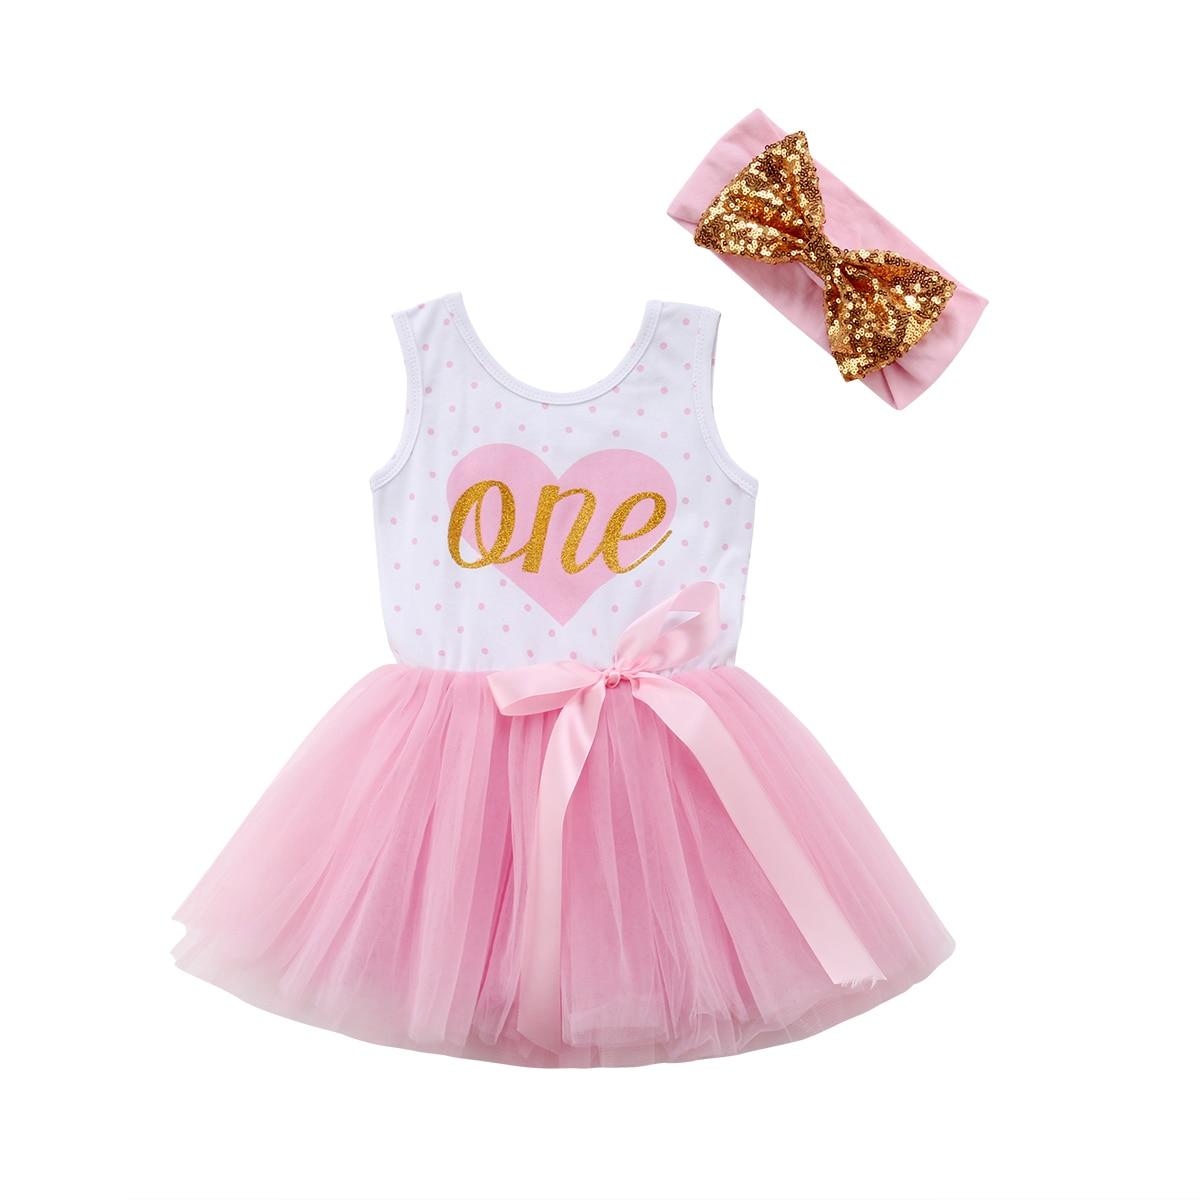 Princess Newborn Infant Baby Girls Sleeveless Tulle Dresses First Birthday Party Wedding Dress For Girls Baby Girls Clothing